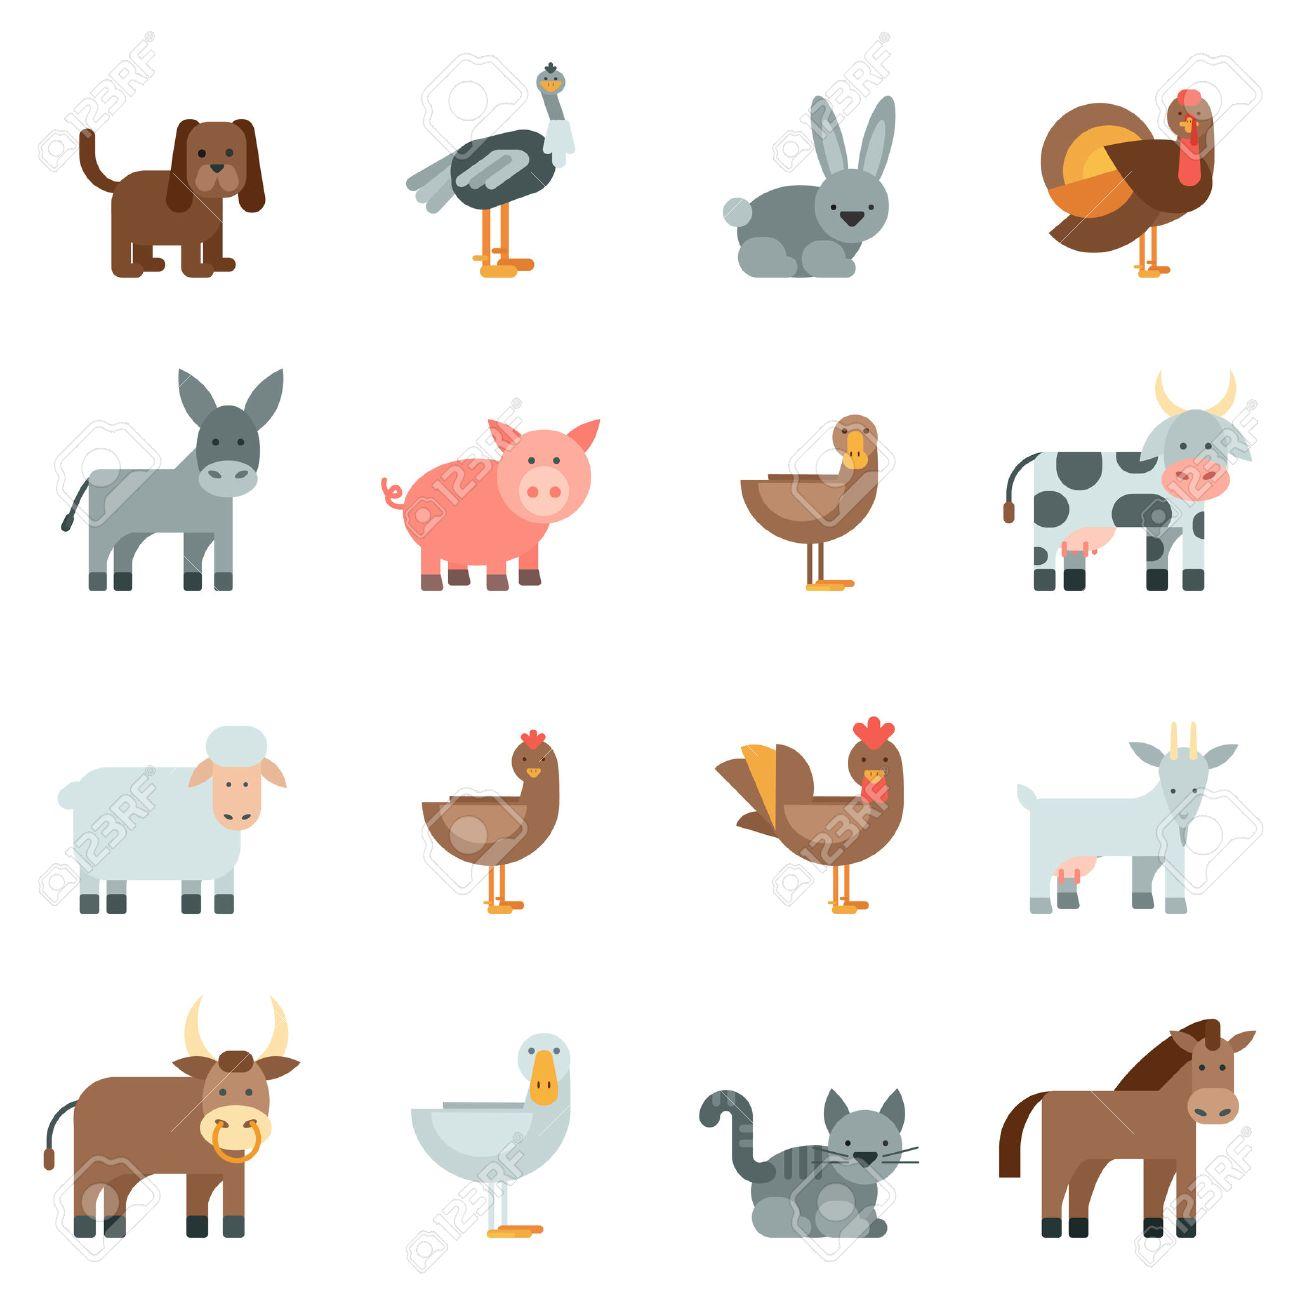 Domestic animal flat icons set with dog rabbit donkey isolated vector illustration Stock Vector - 40459082